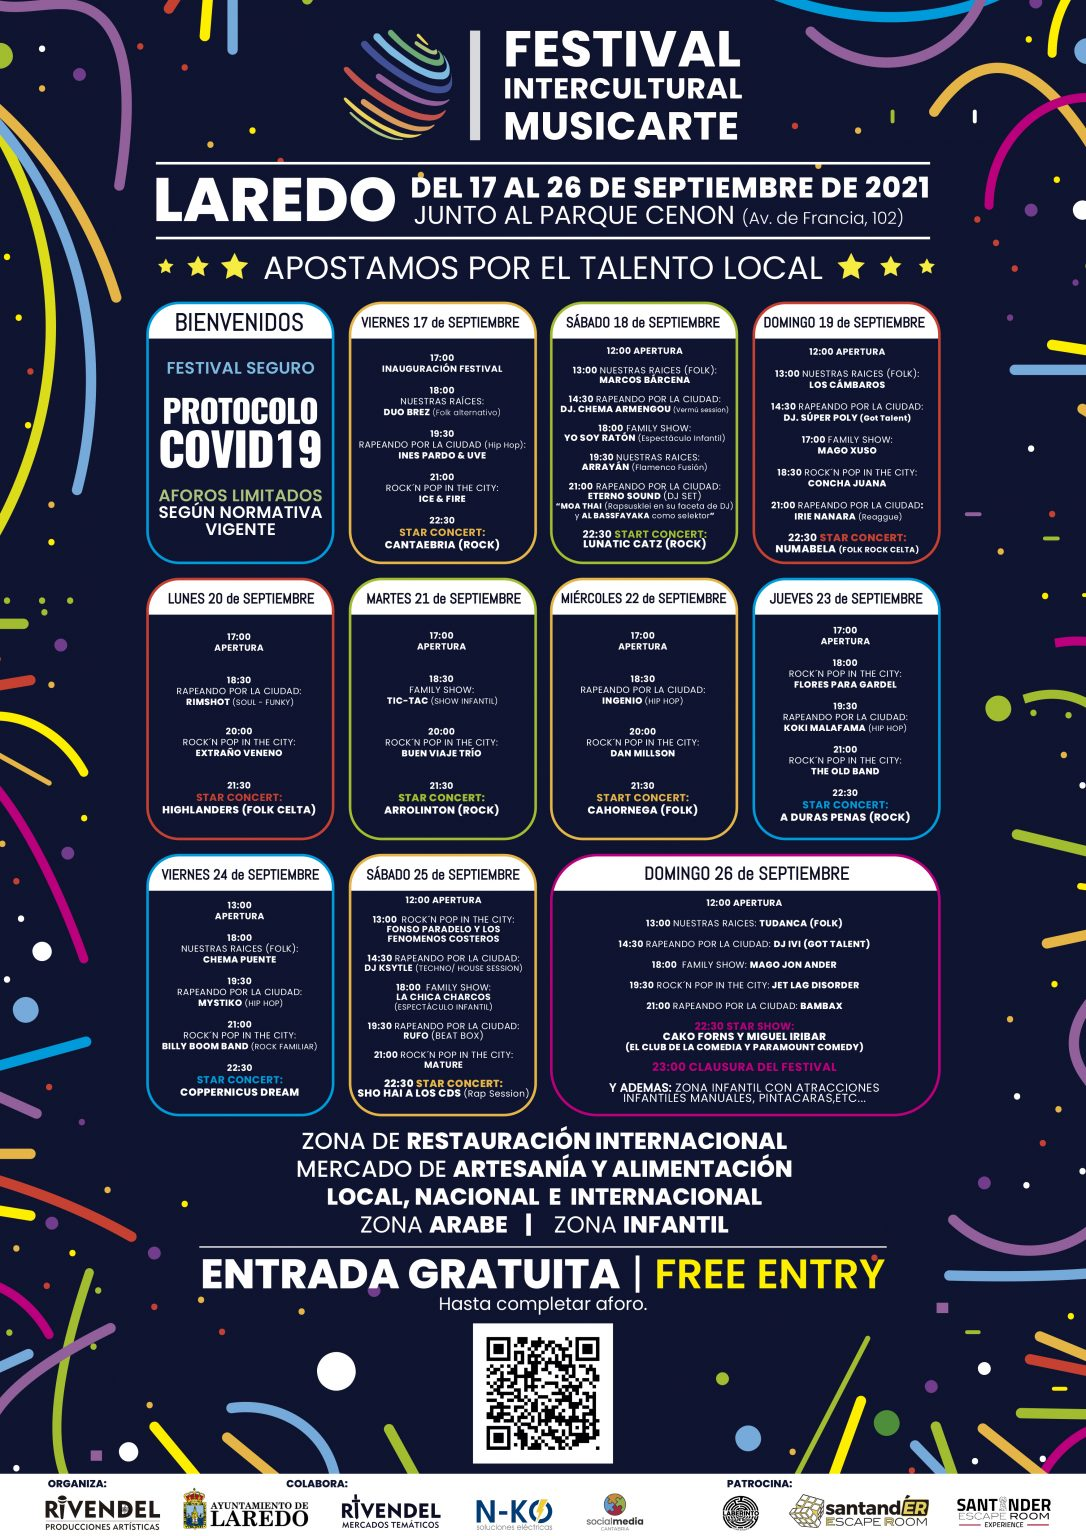 Festival Intercultural Musicarte - Laredo